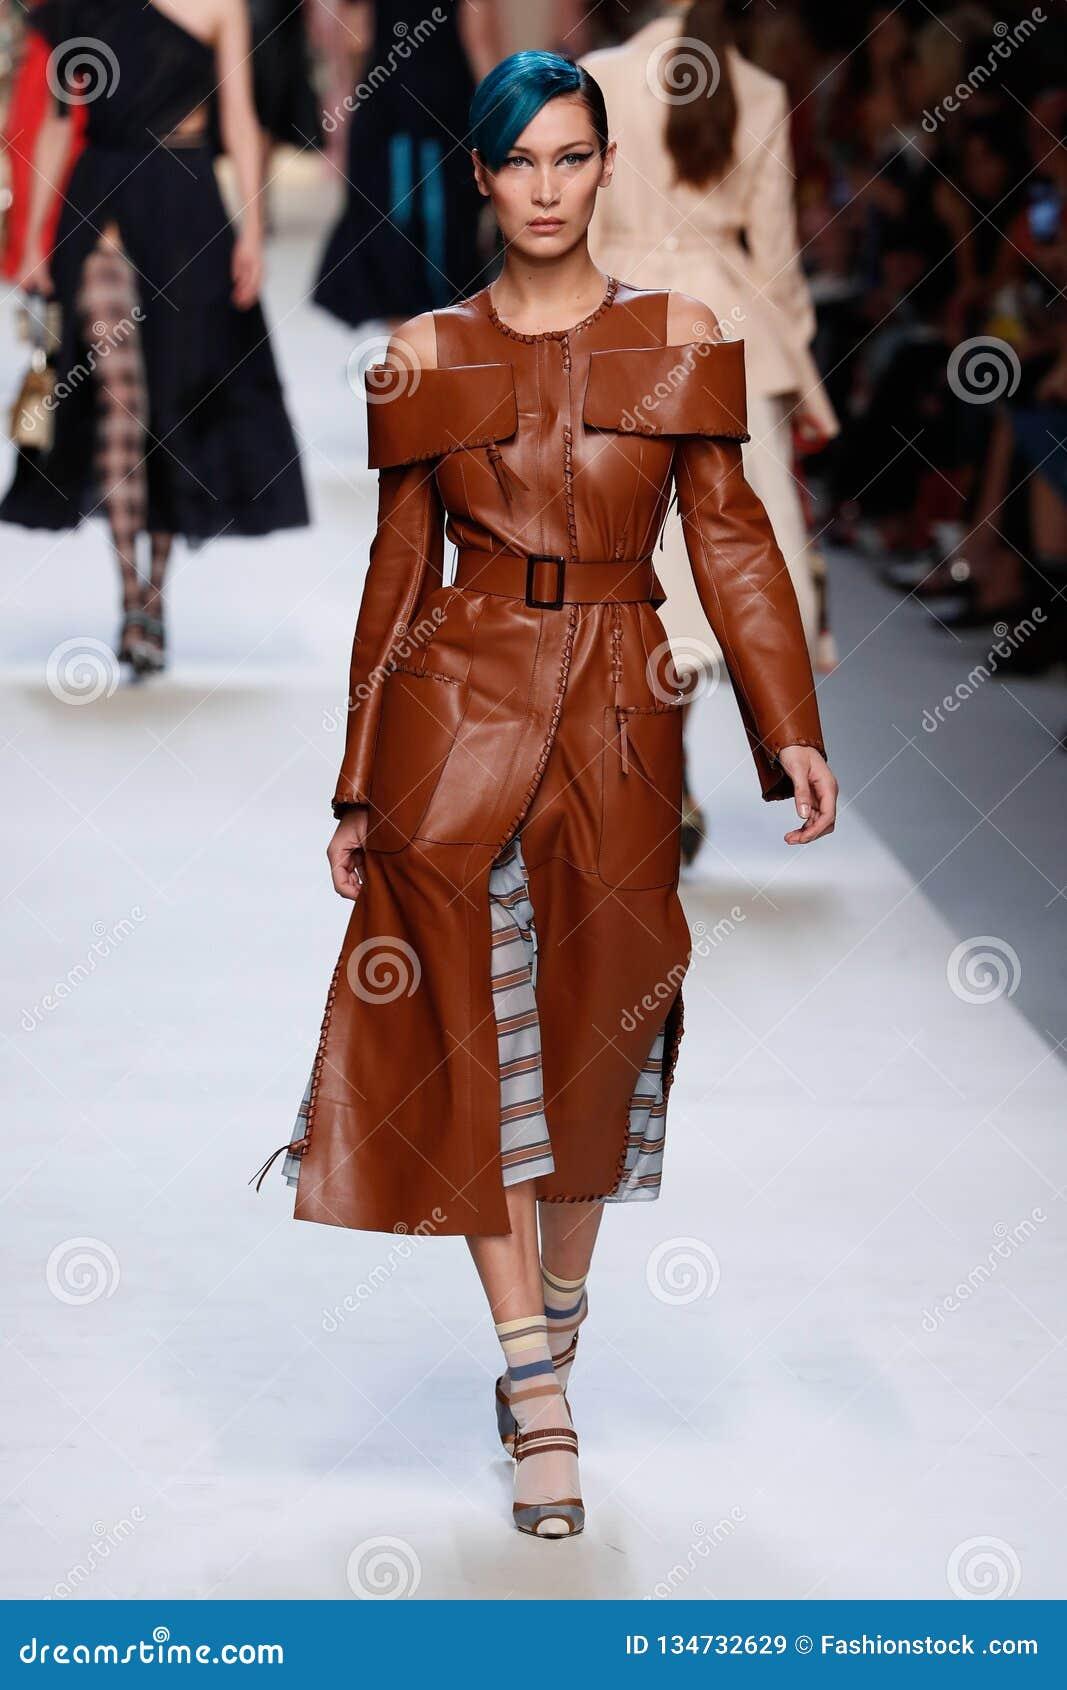 6ea3494059b Bella Hadid Walks The Runway At The Fendi Show During Milan Fashion ...